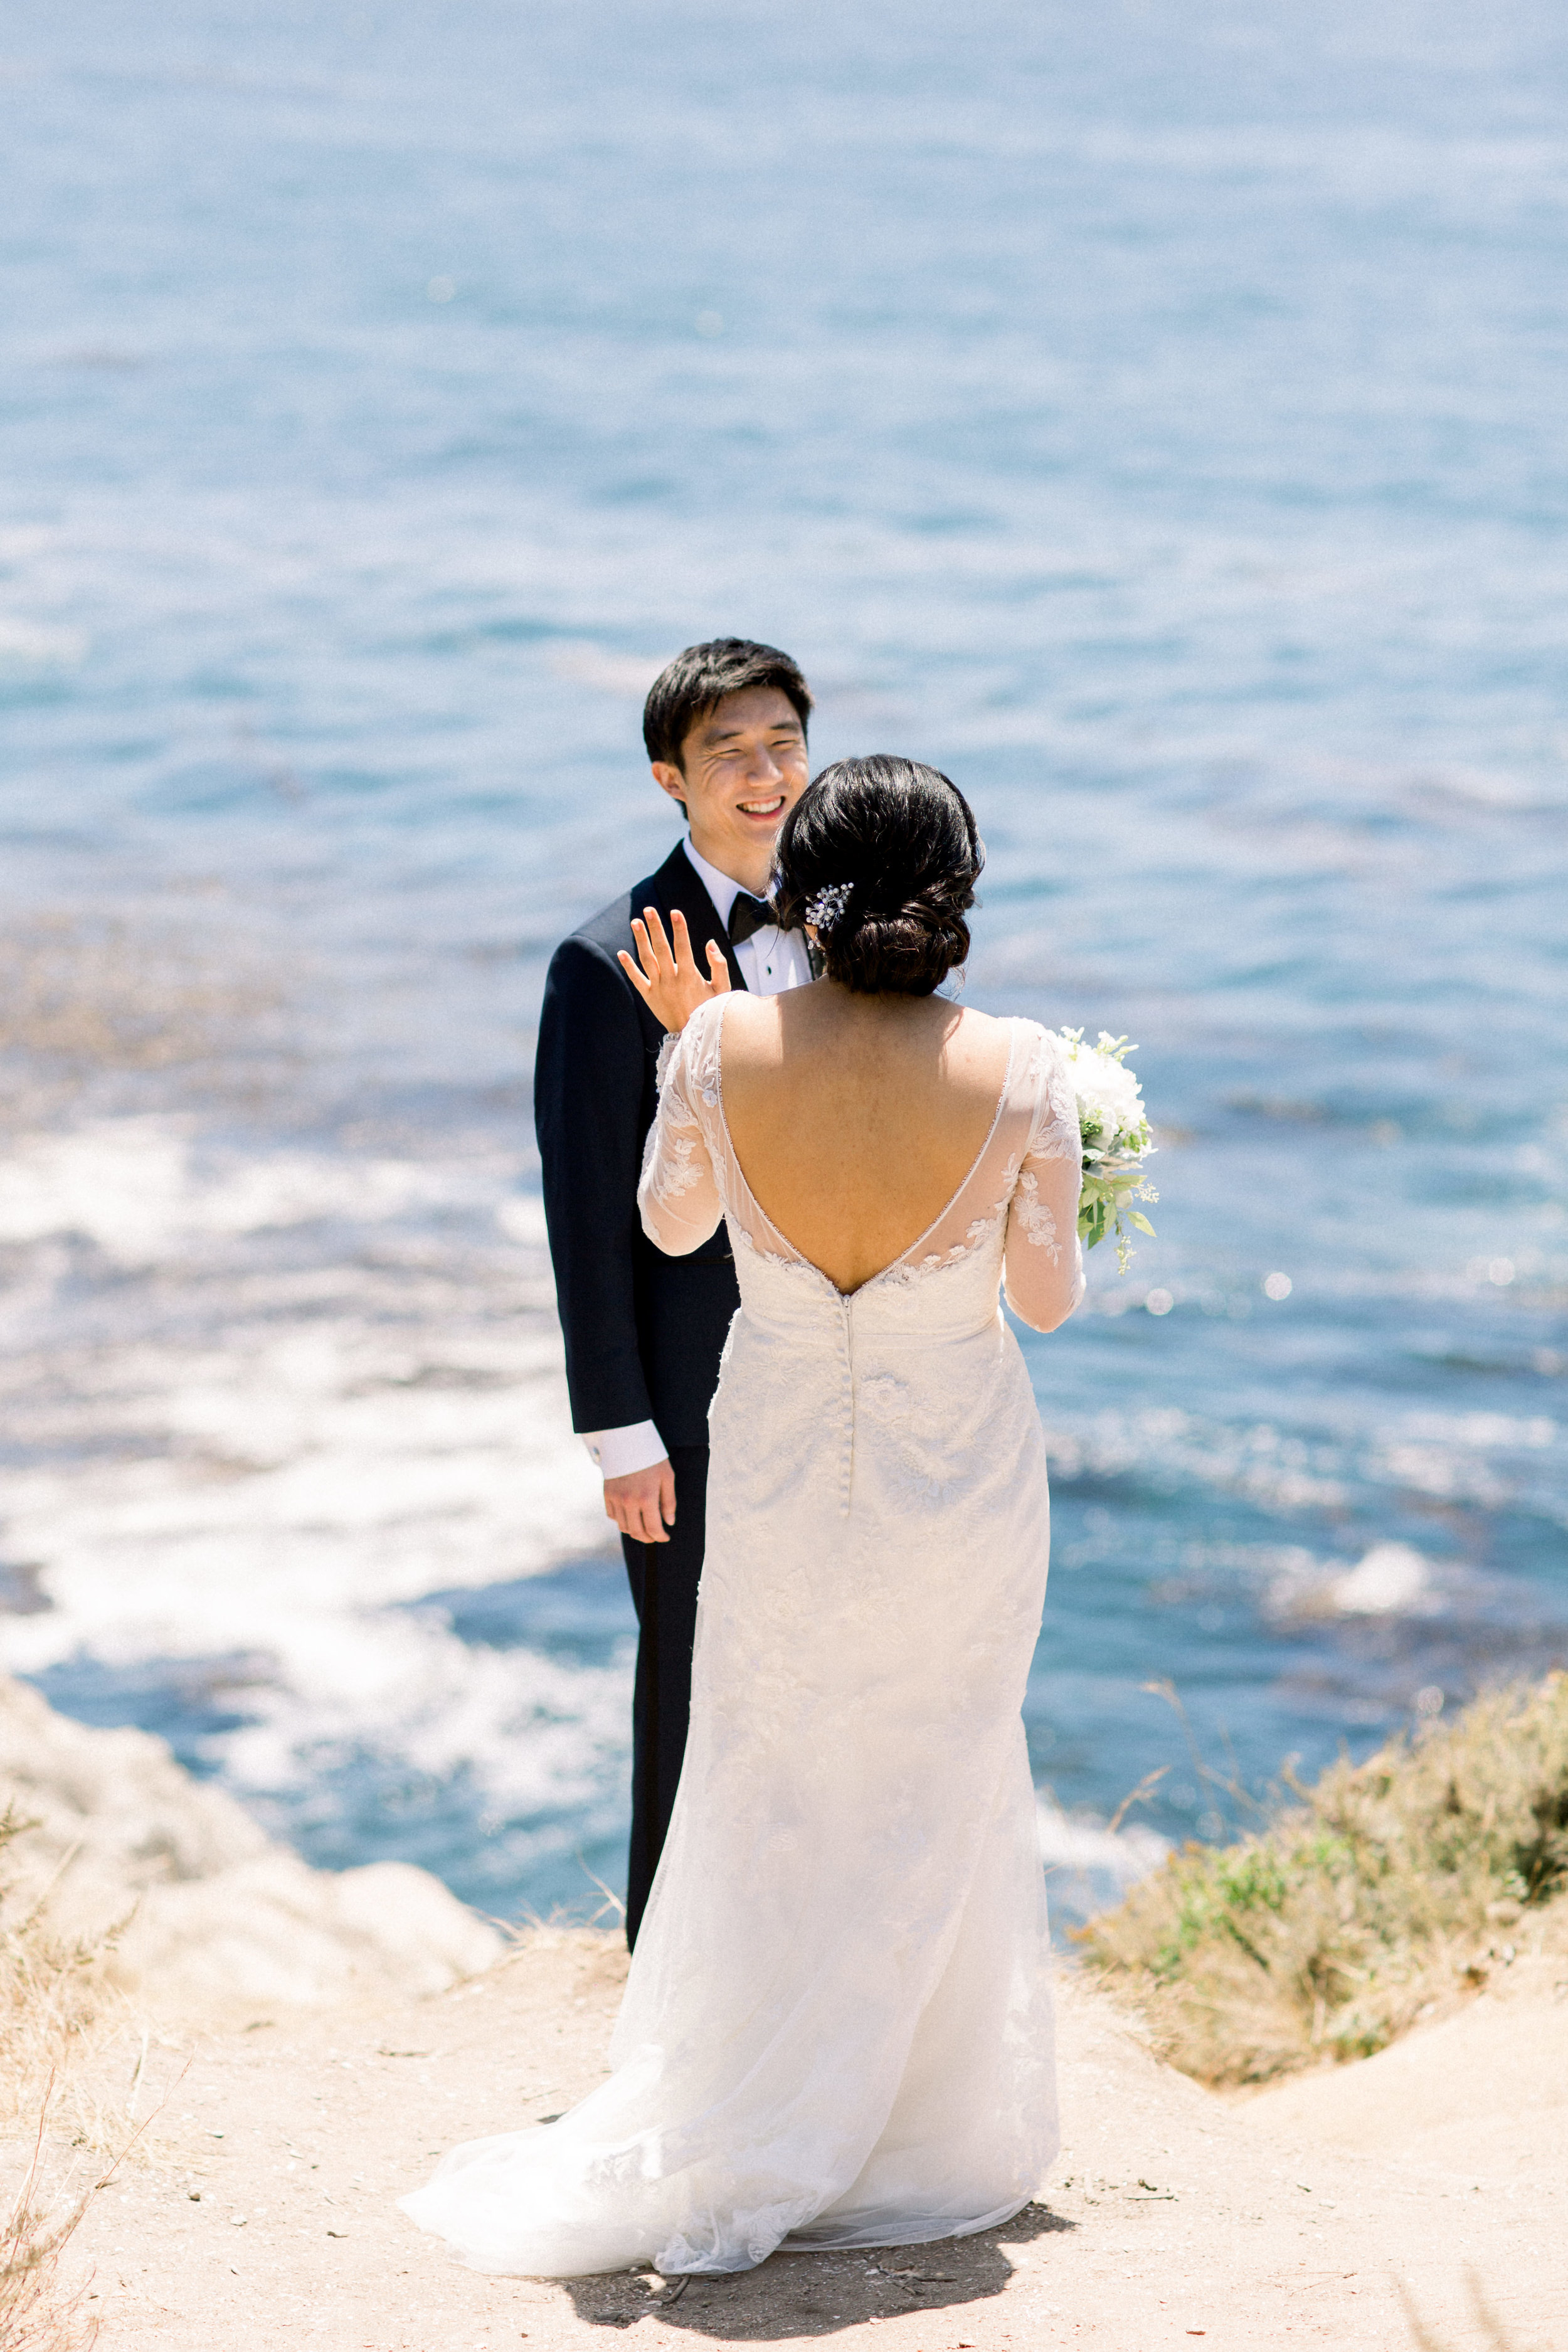 Cliffside-Carmel-valley-wedding-by-kristine-herman-photography.jpg